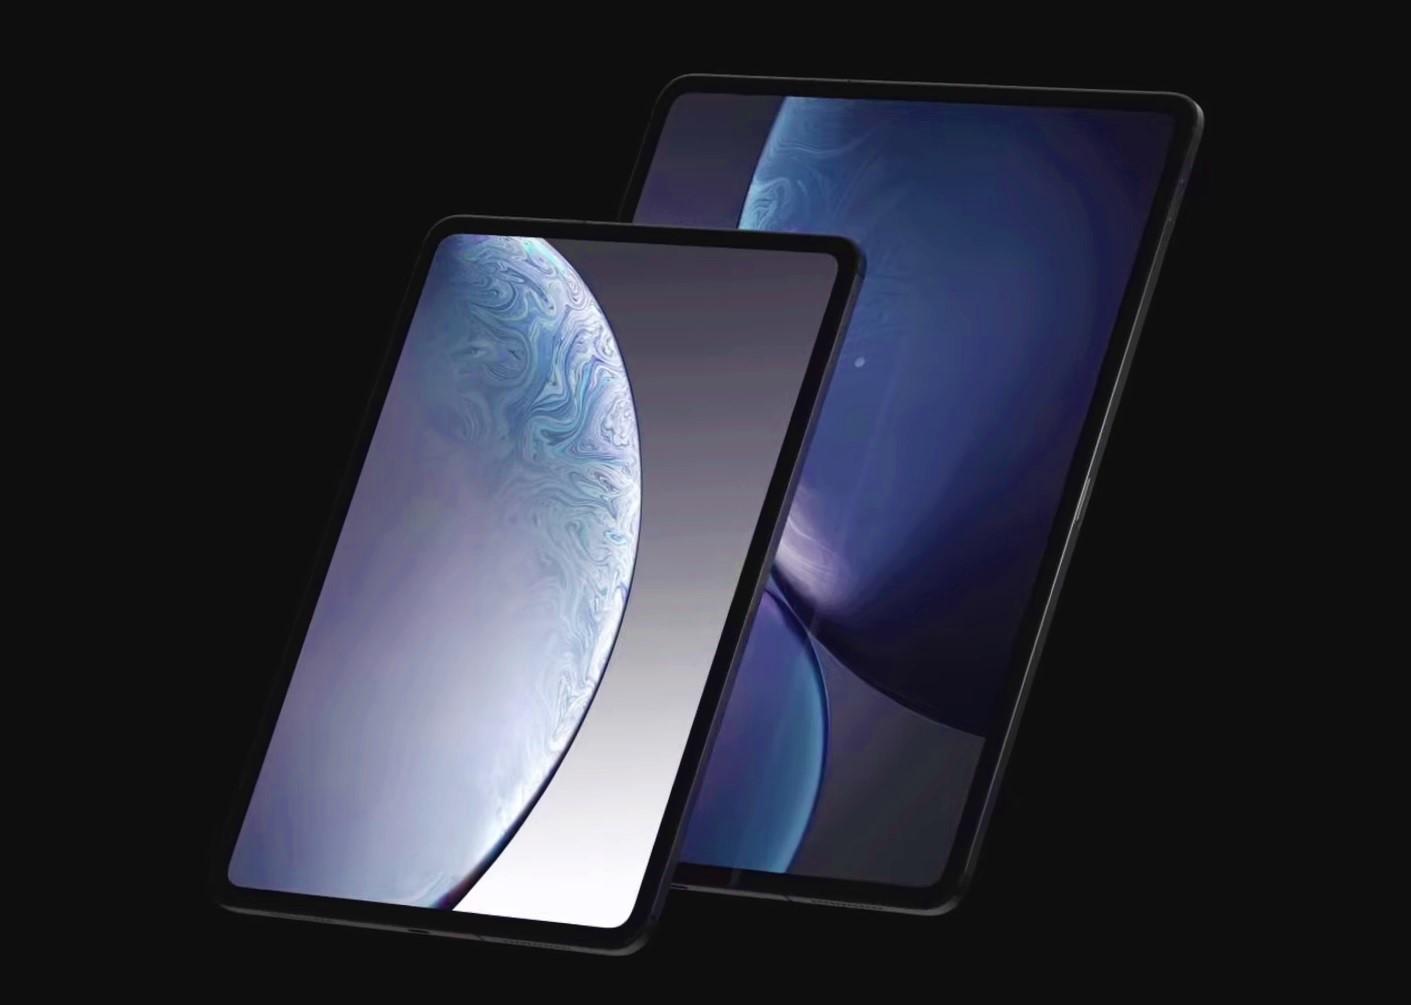 2022 M2 iPad Pro